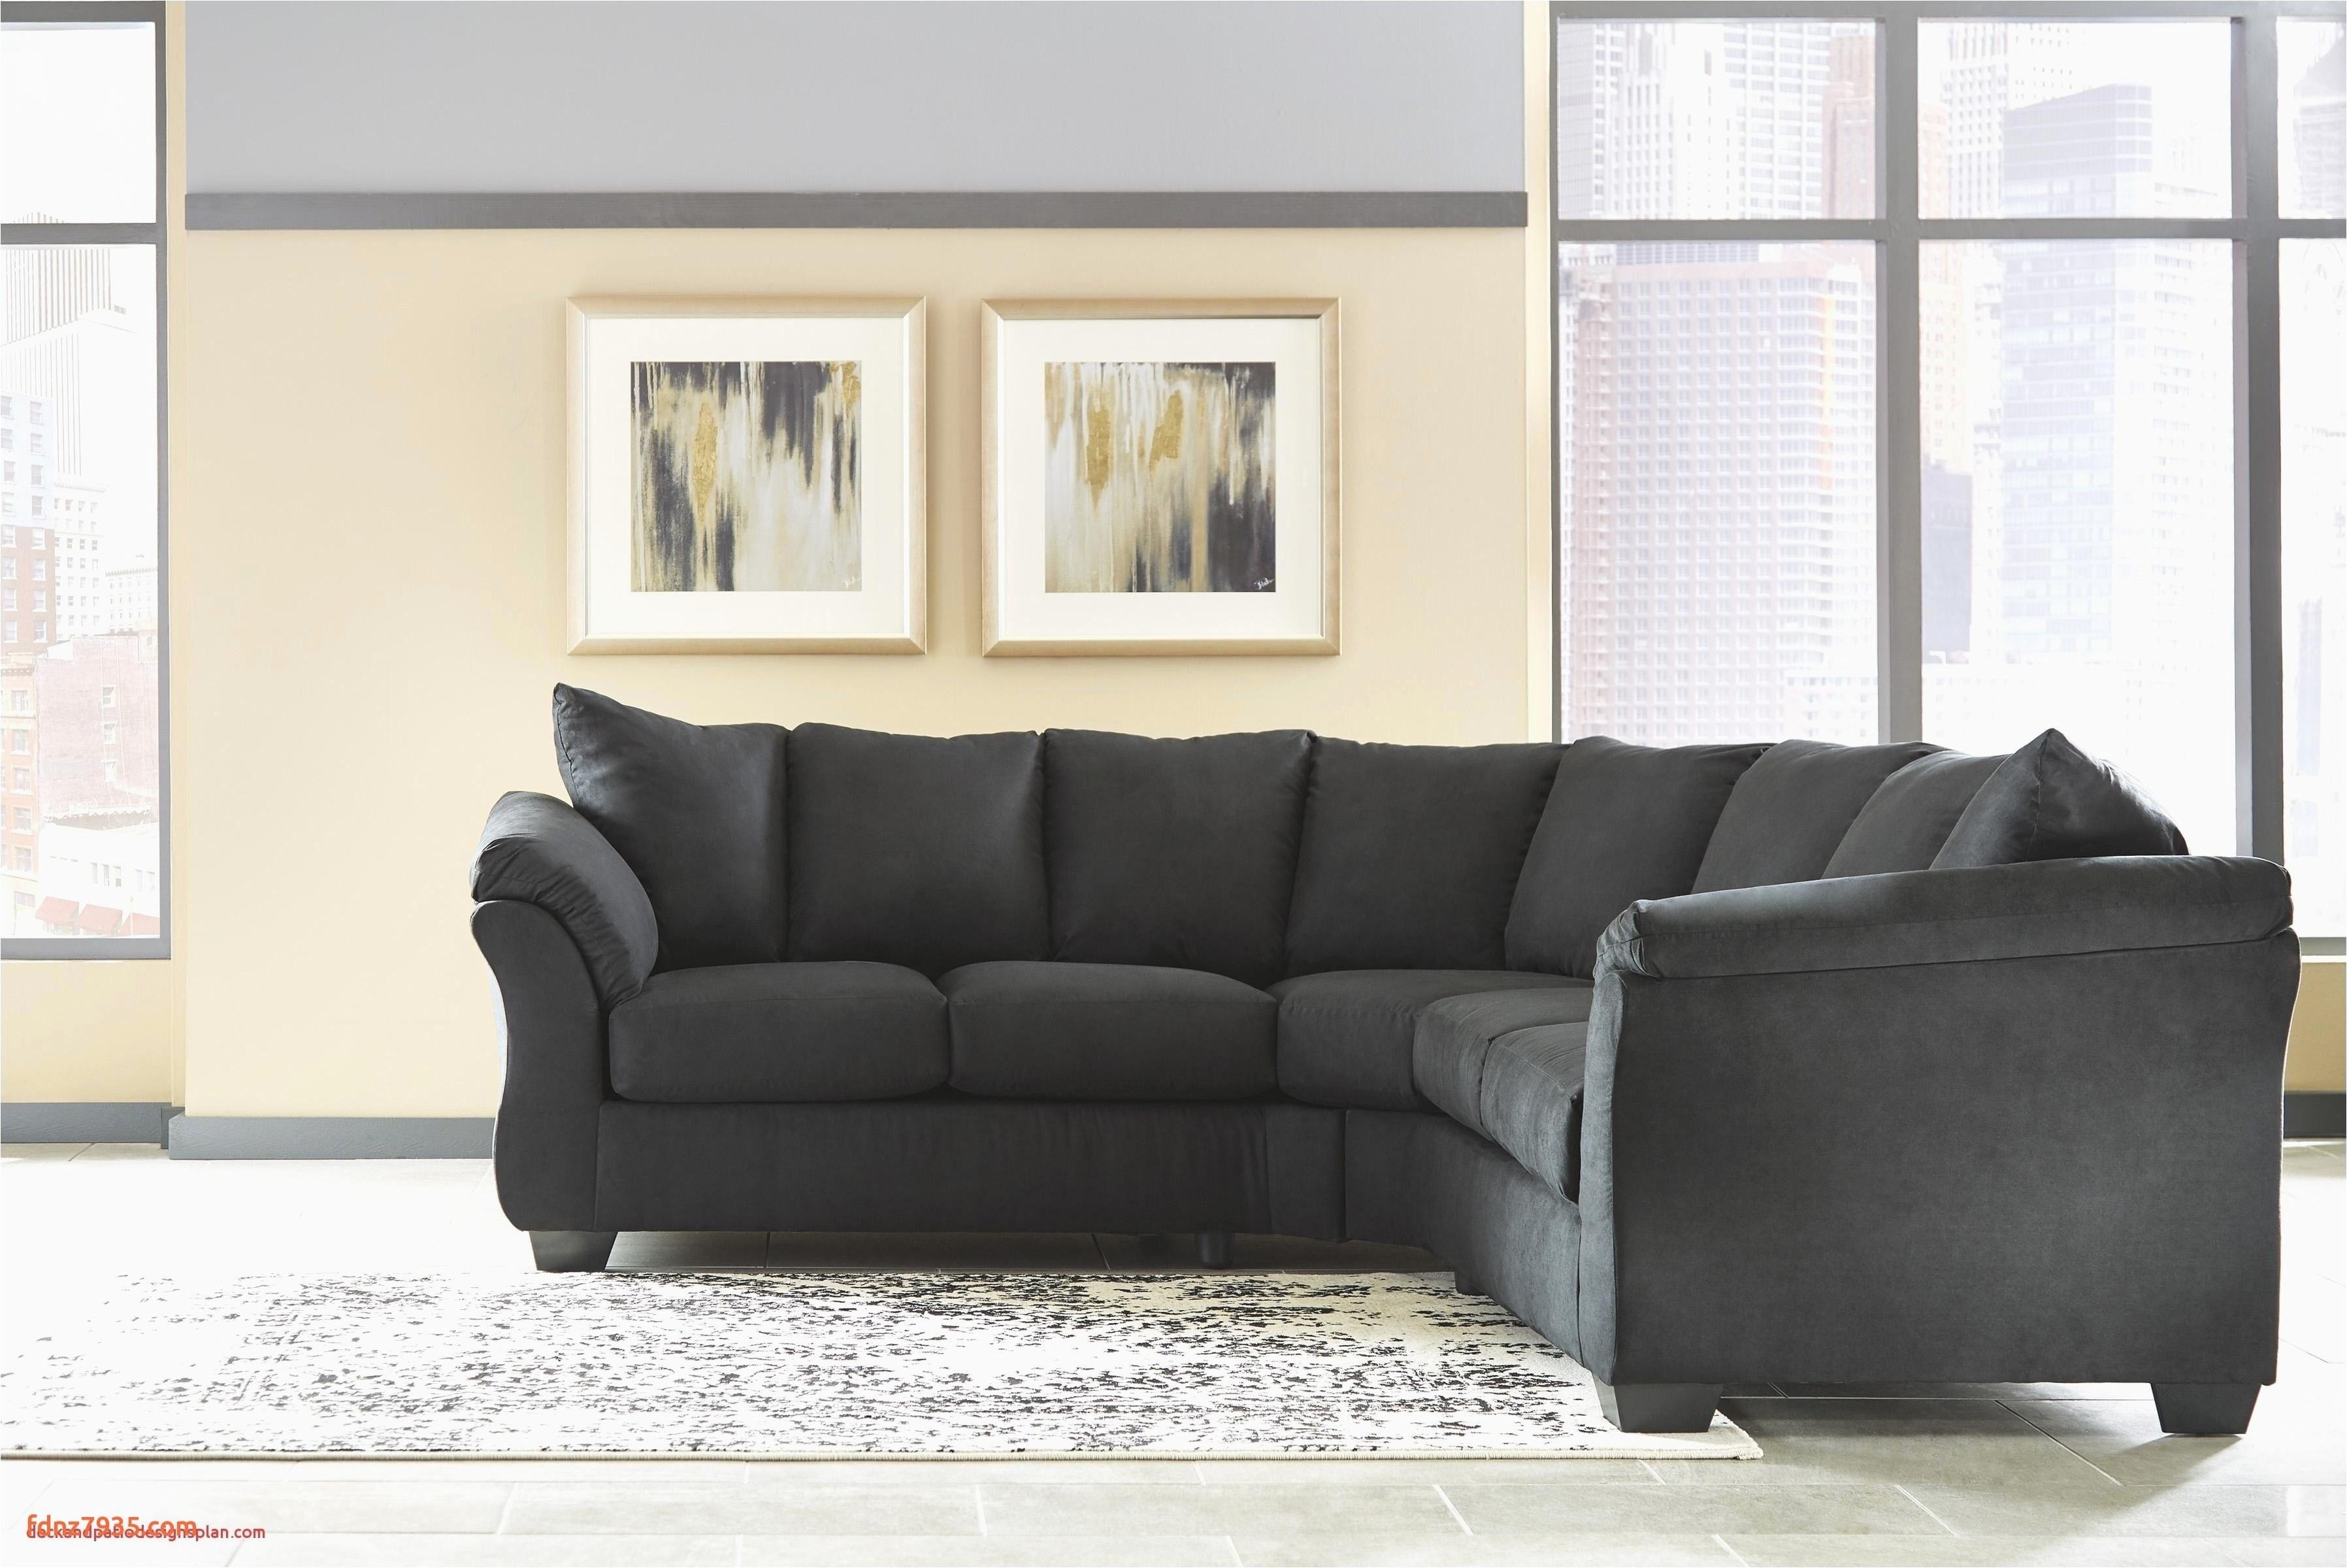 room to go sofa unique gunstiges sofa sofa big gunstige sofa macys furniture 0d archives